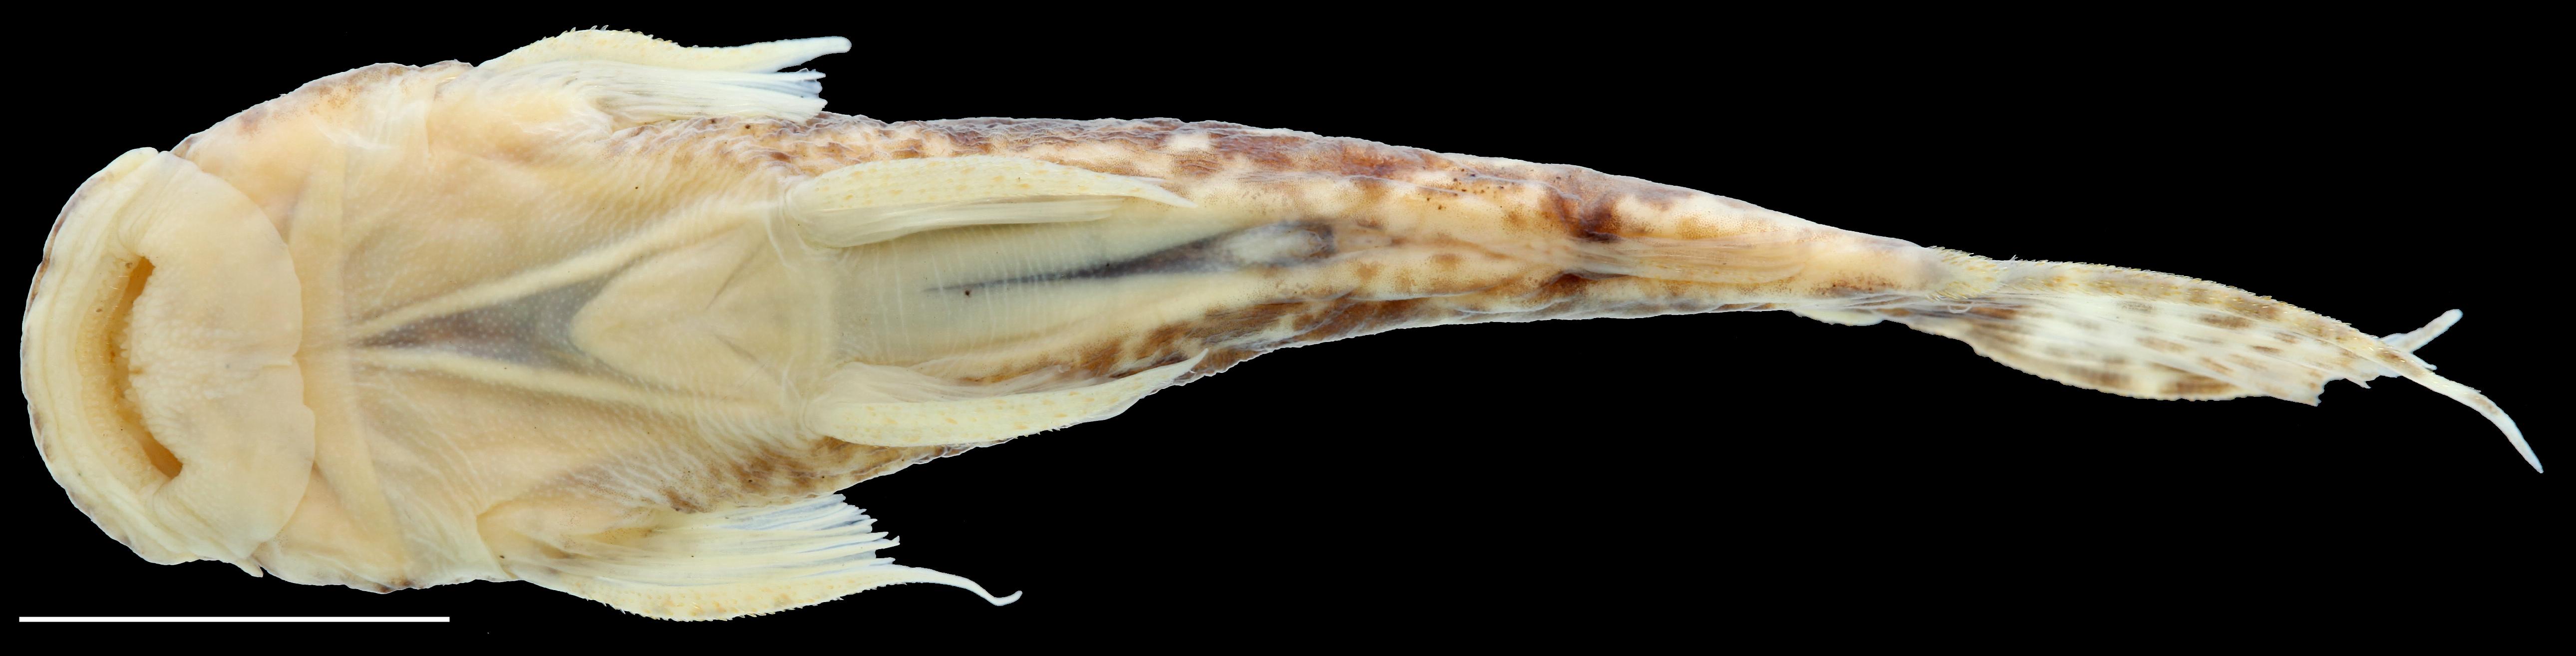 Paratype of <em>Astroblepus putumayoensis</em>, IAvH-P-12708_Ventral, 43.6 mm SL (scale bar = 1 cm). Photograph by C. DoNascimiento